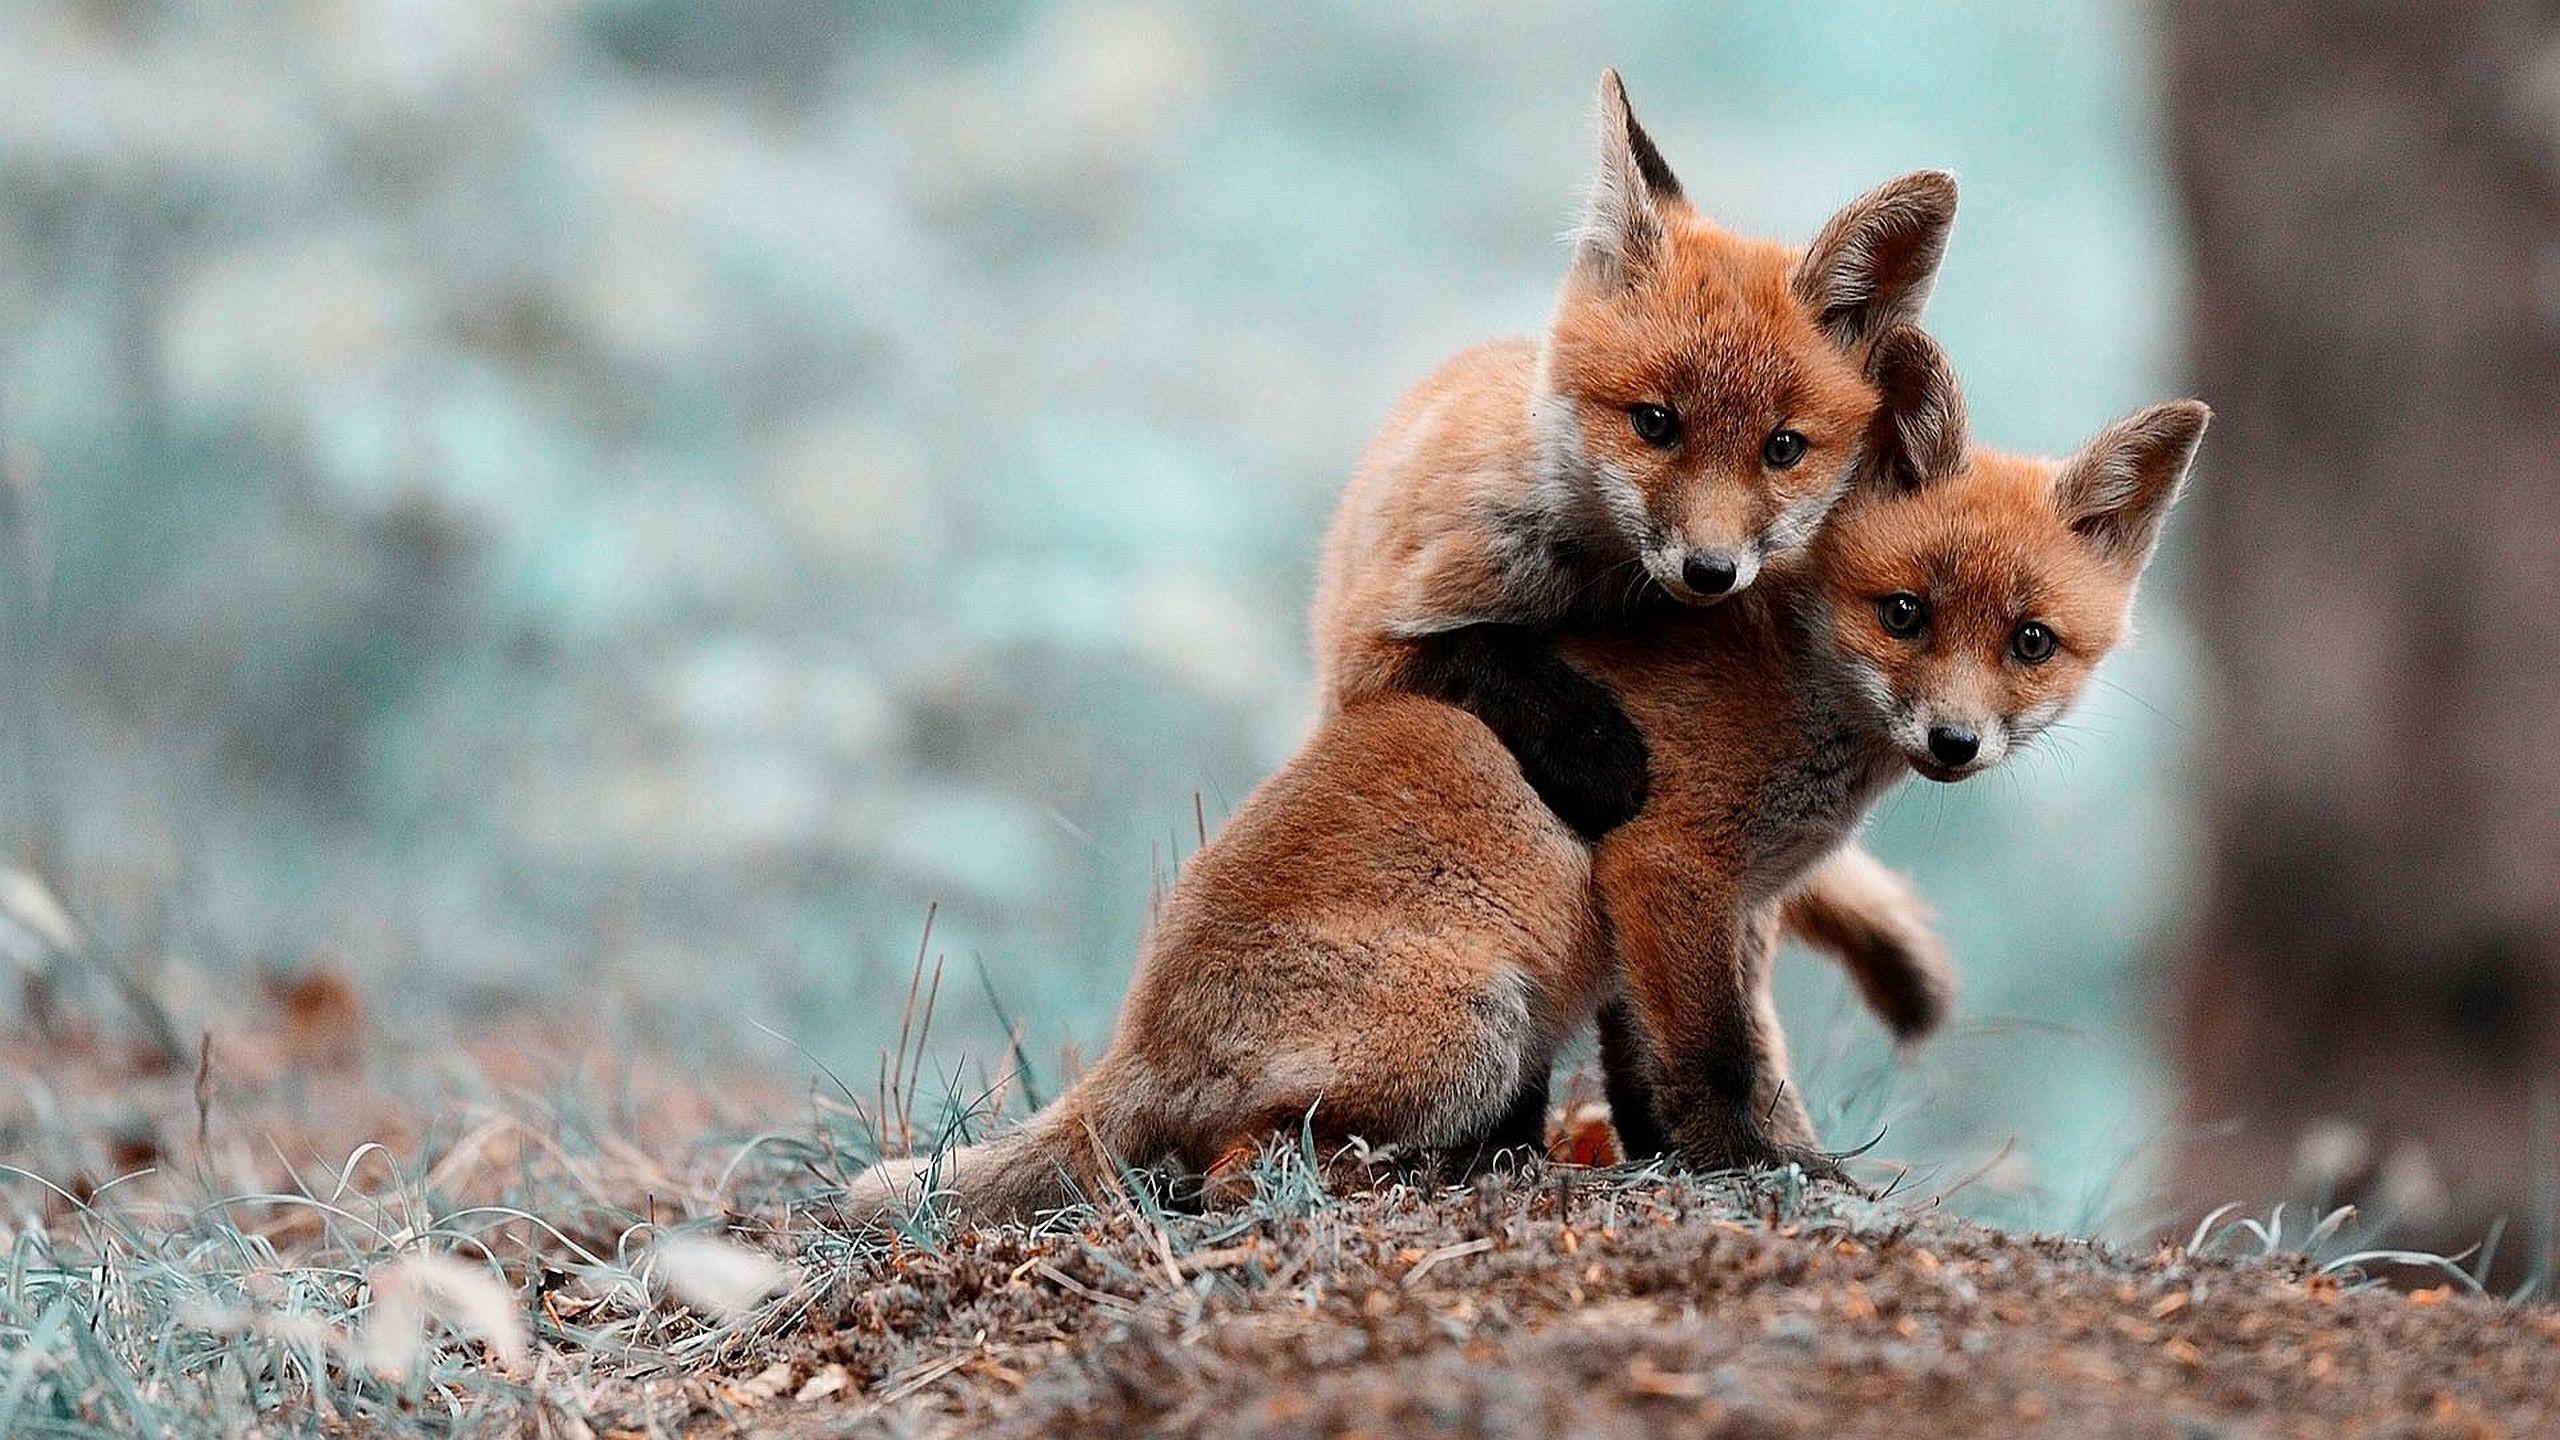 General 2560x1440 cubs fox cubs  fox nature blurred animals baby animals mammals